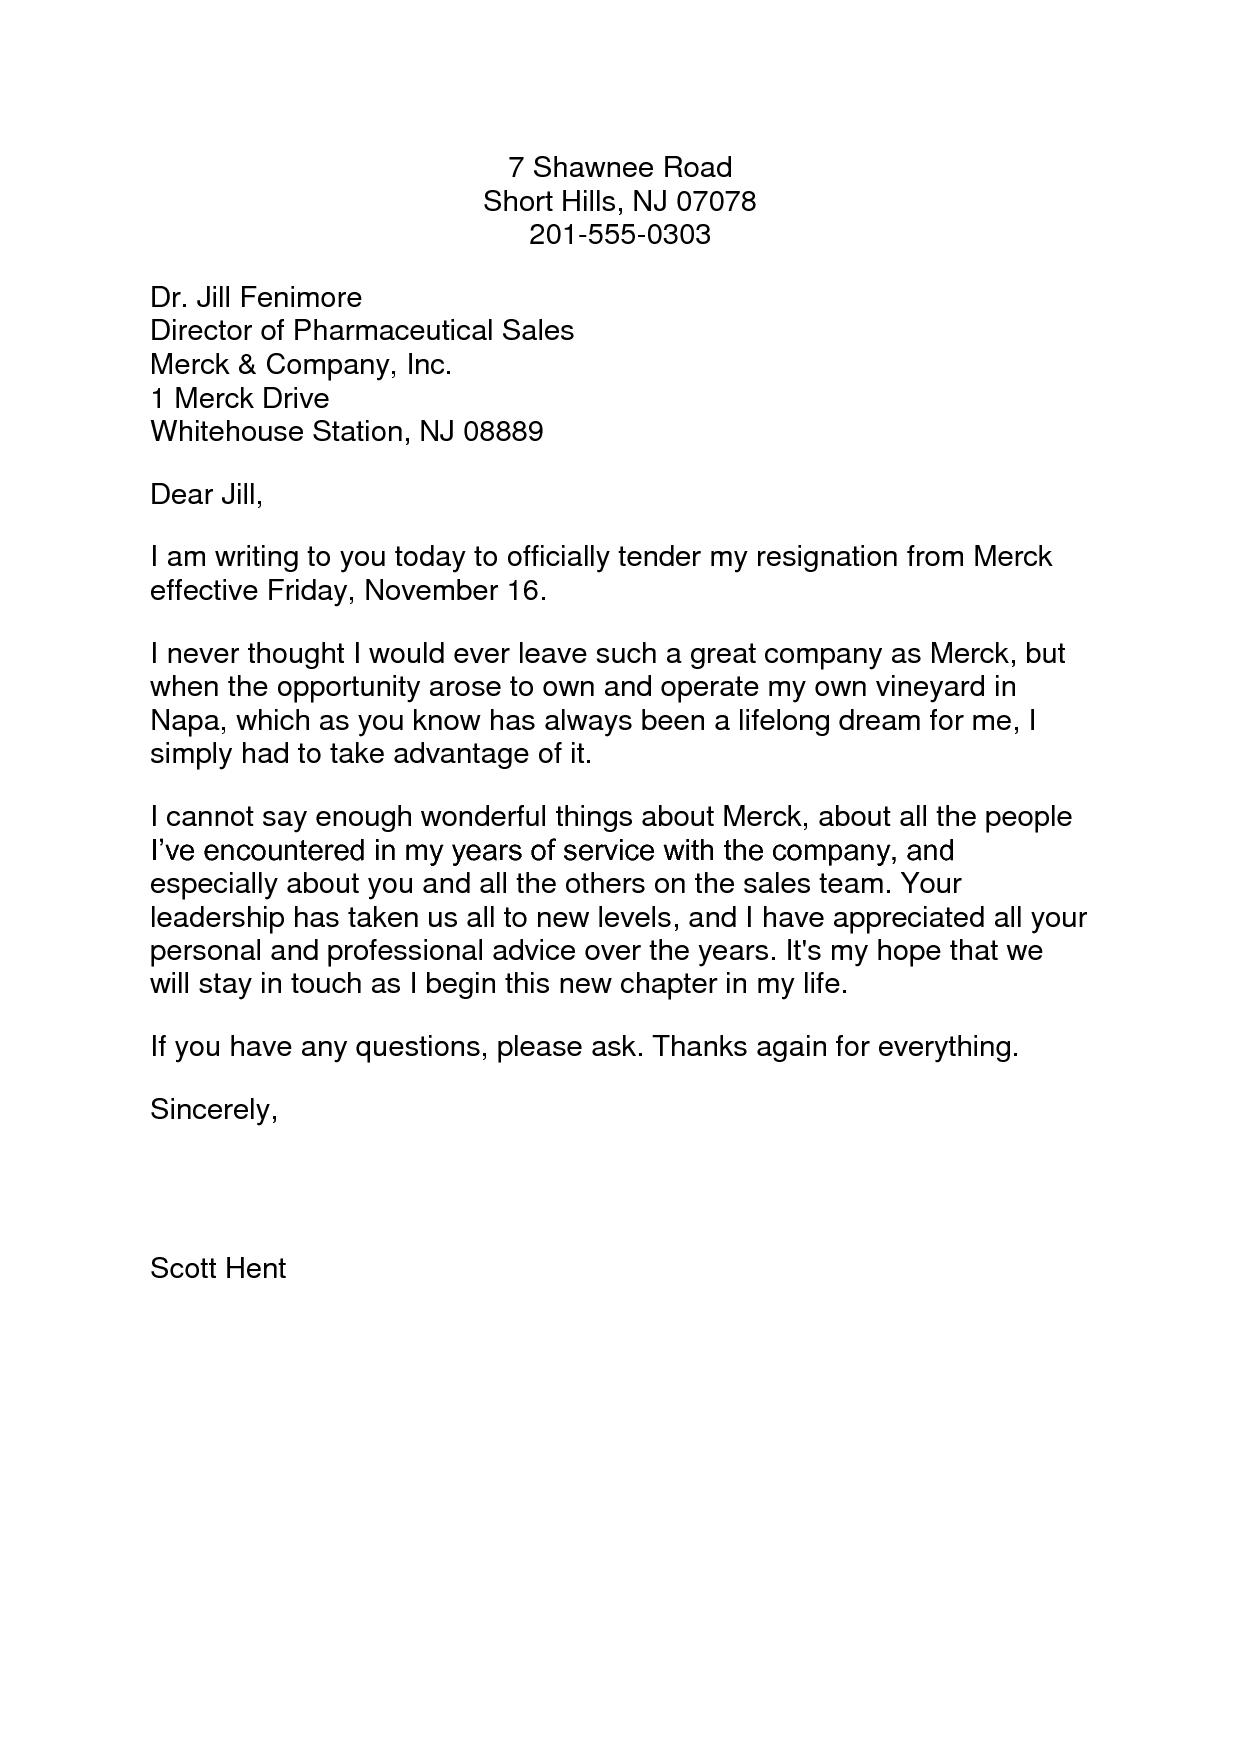 Pin by Hannah Spangler on Grad school  Cover letter template Resum Job